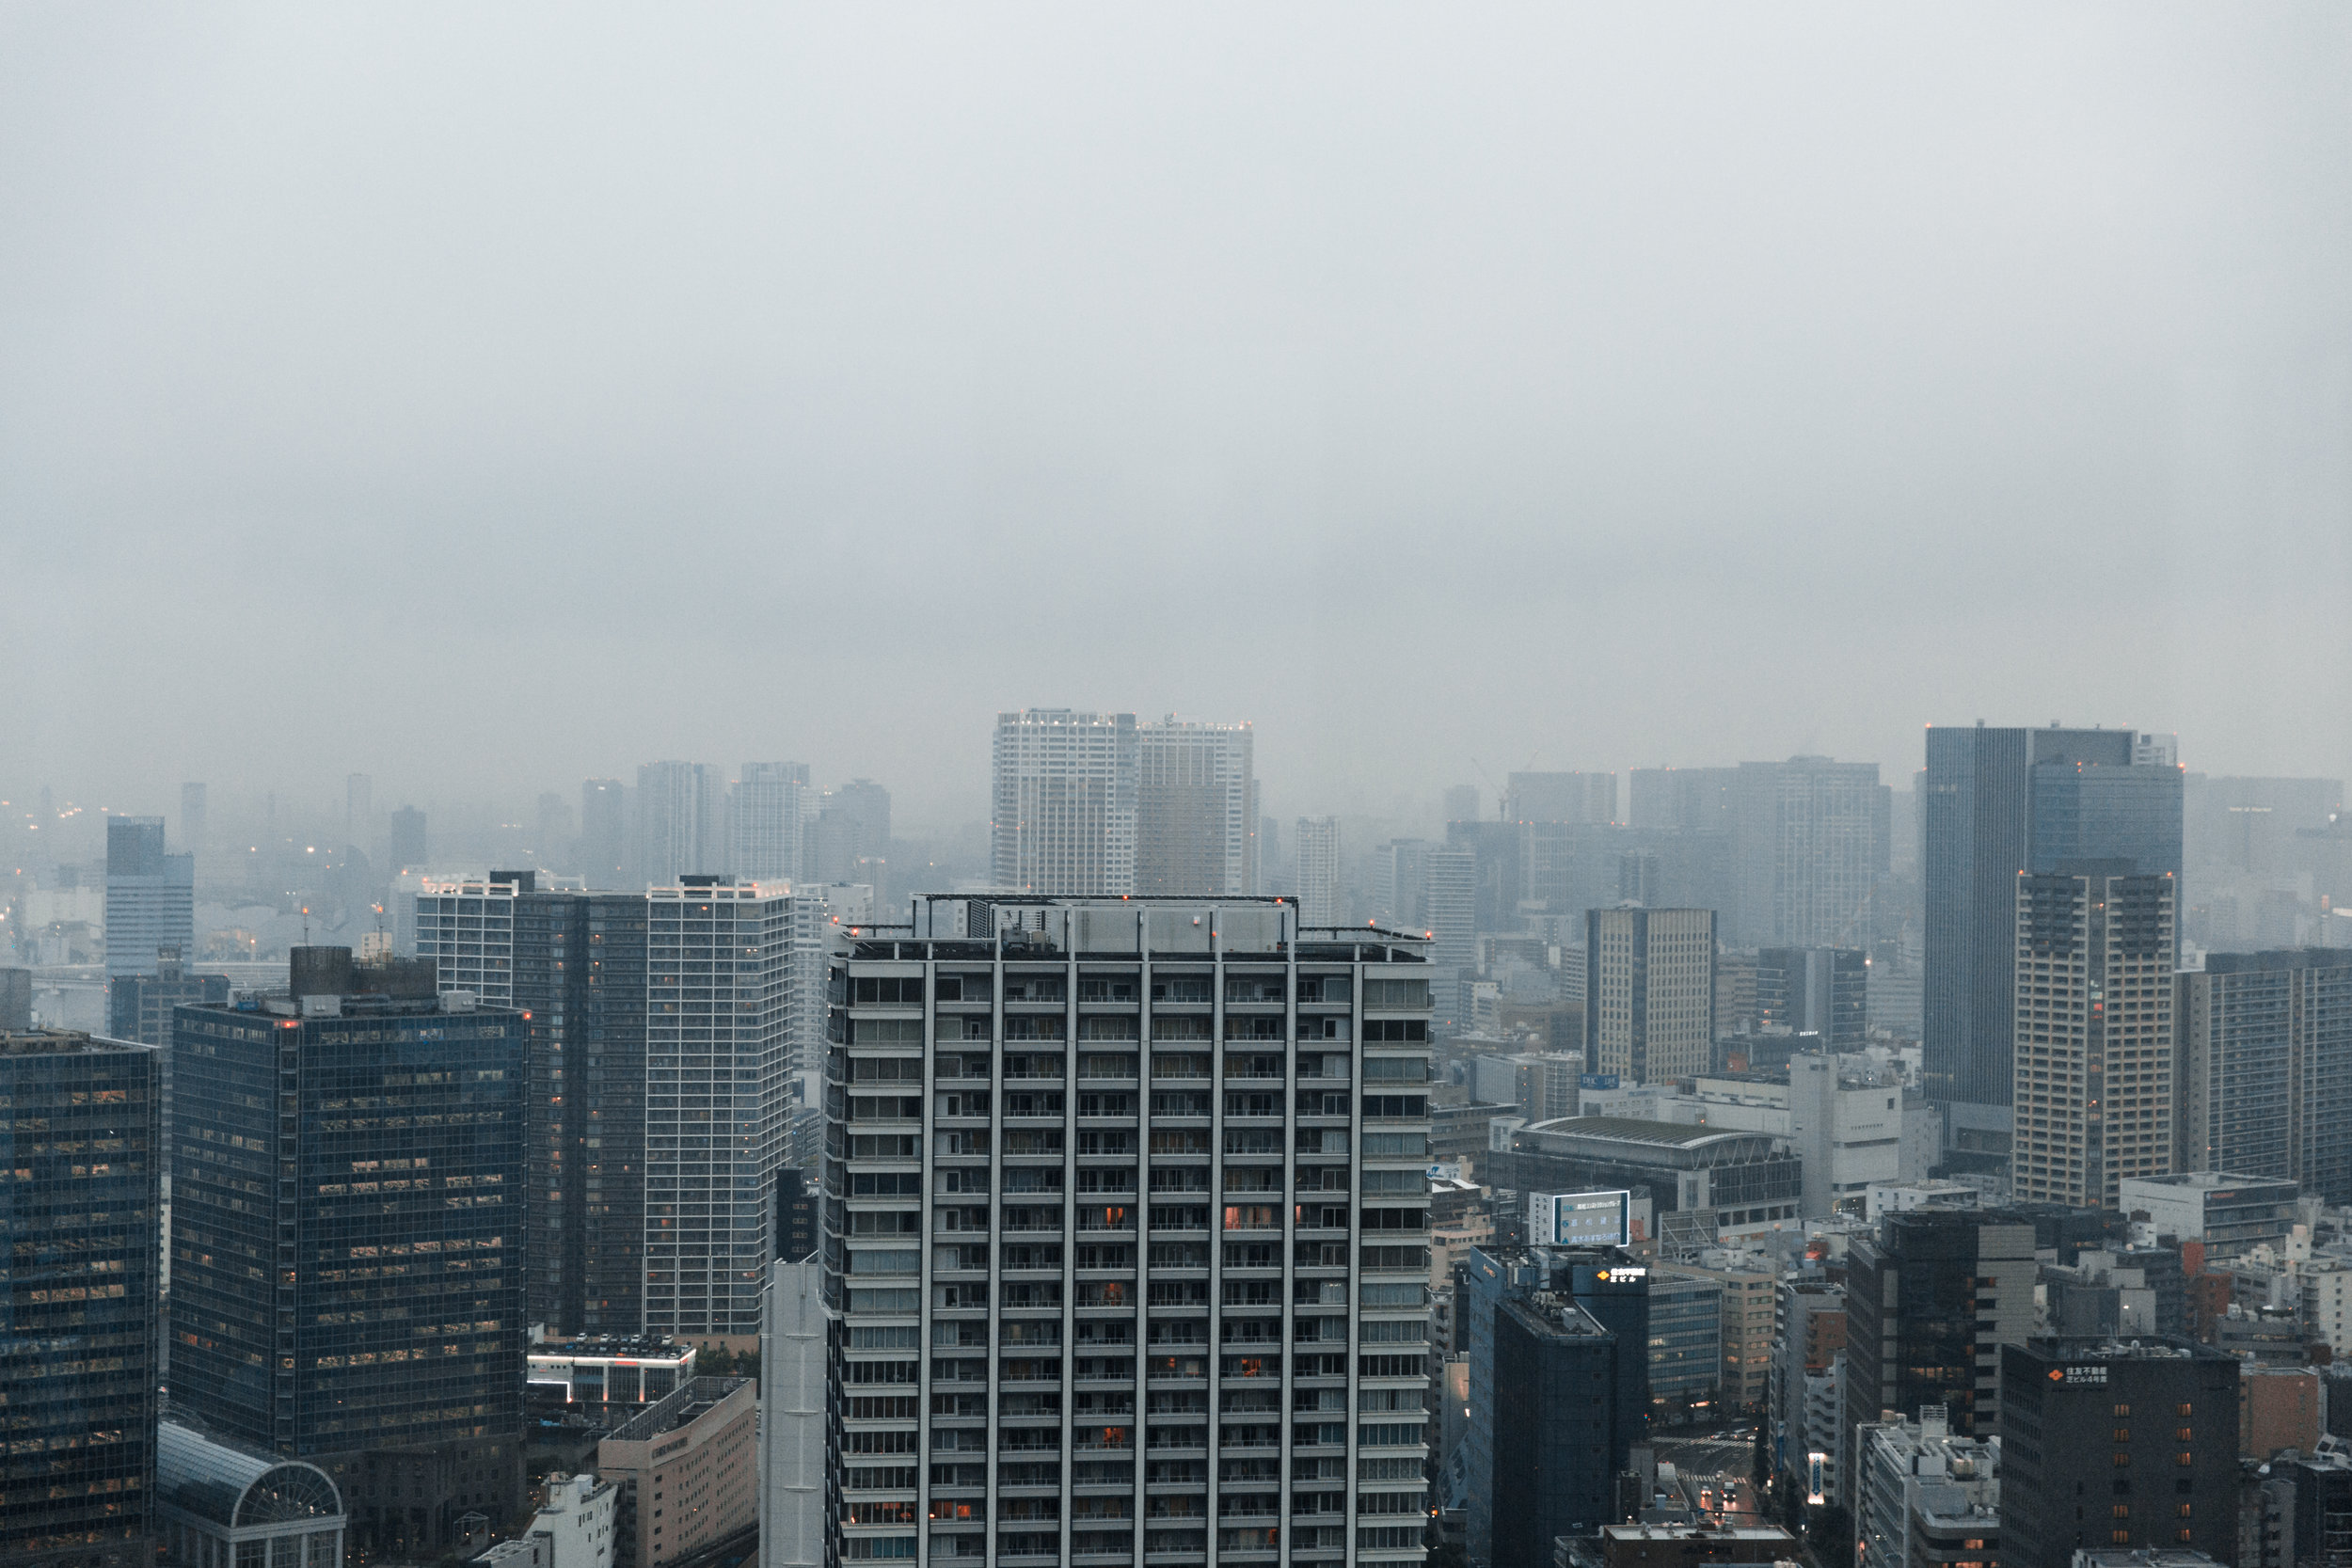 TokyoJapan_2018_AdamDillon_4F8A7926.jpg